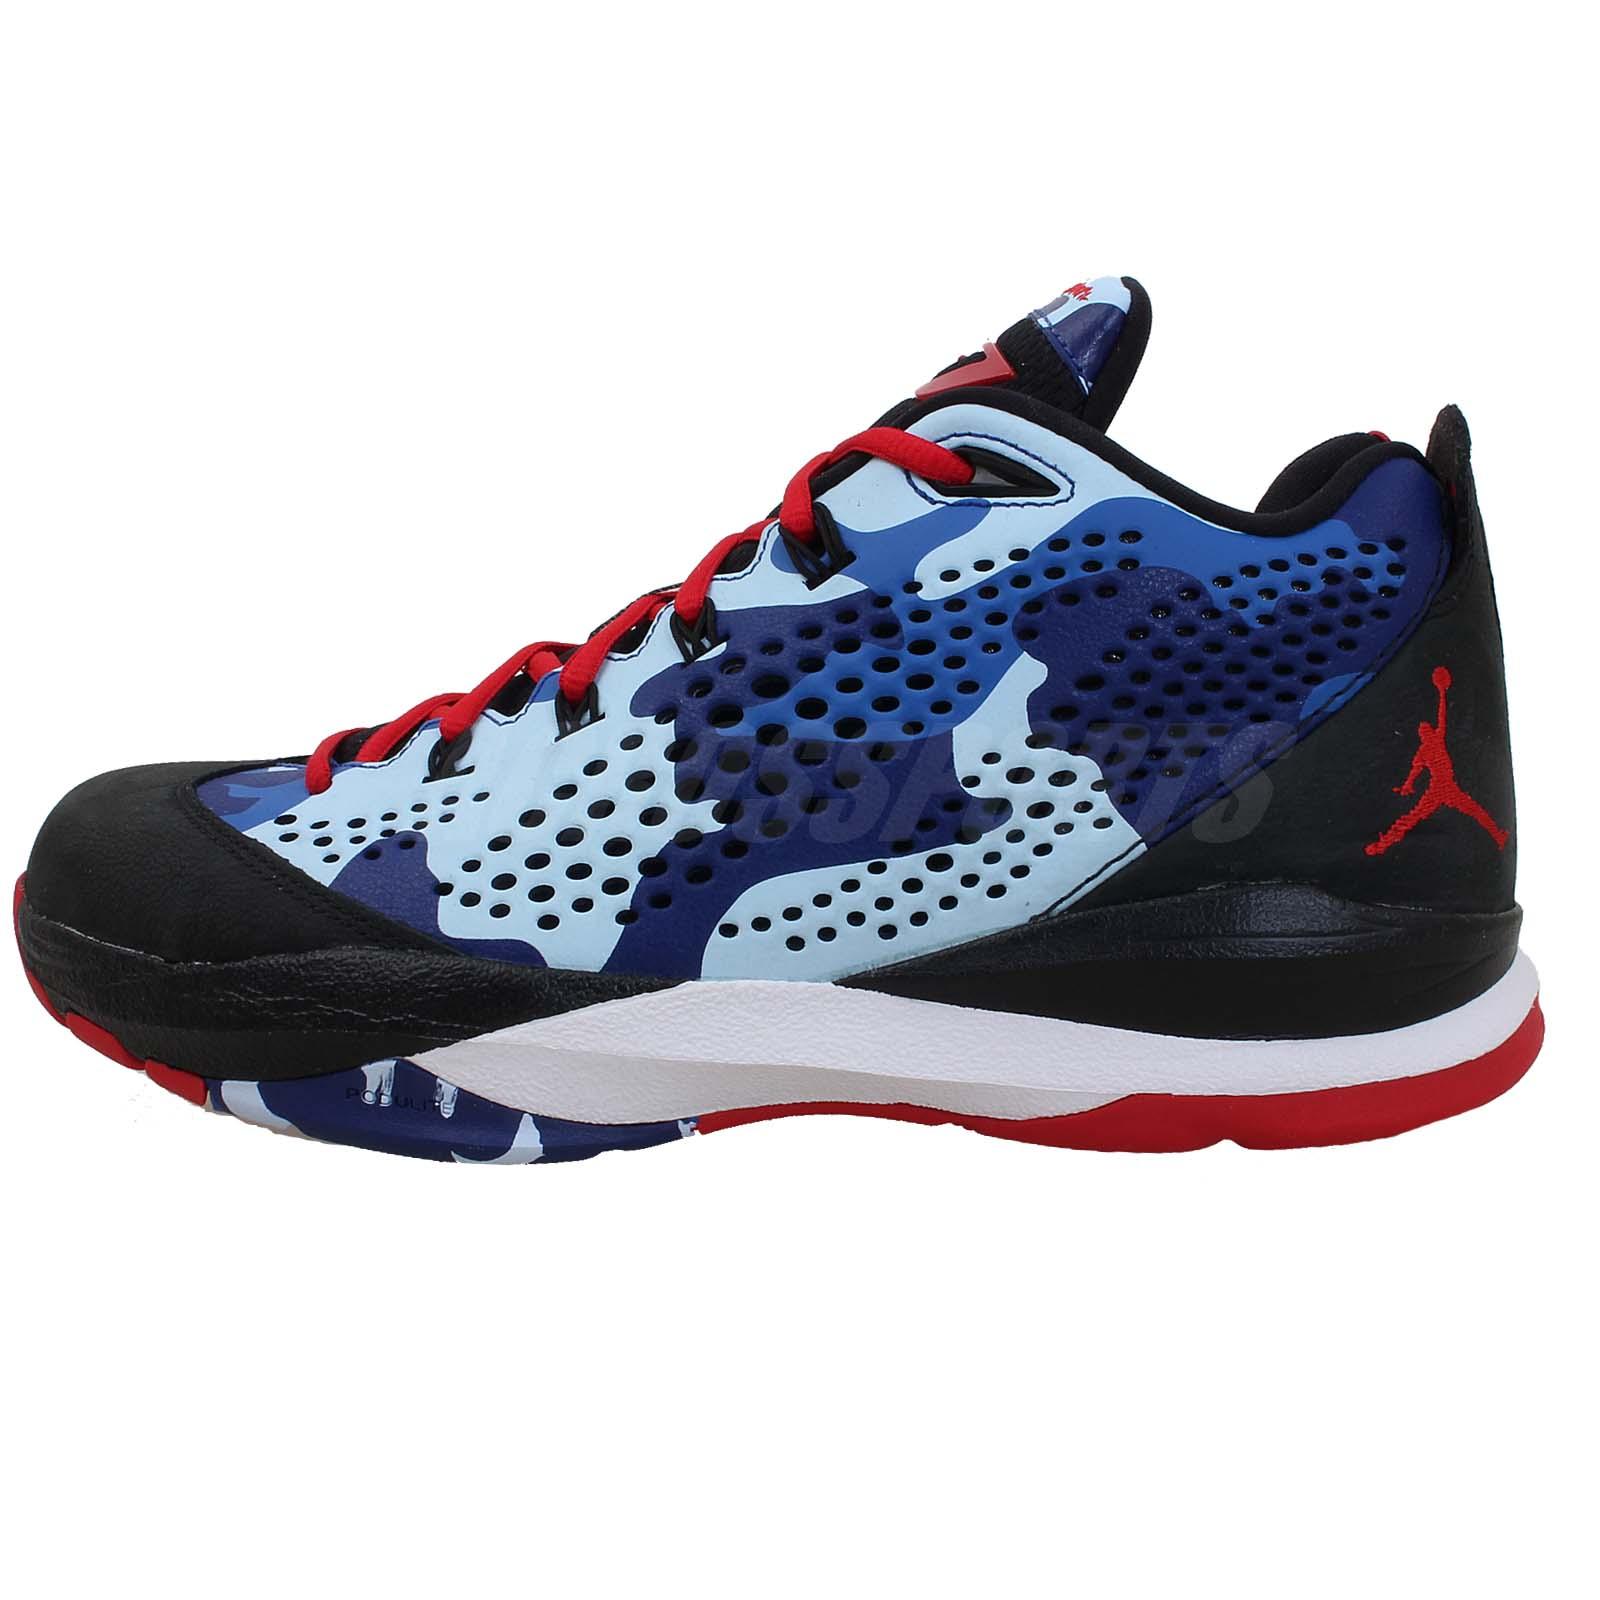 Nike Air Jordan 13 XIII CP3 PE Chris Paul Sunstone Men ...   Chris Paul Shoes 7